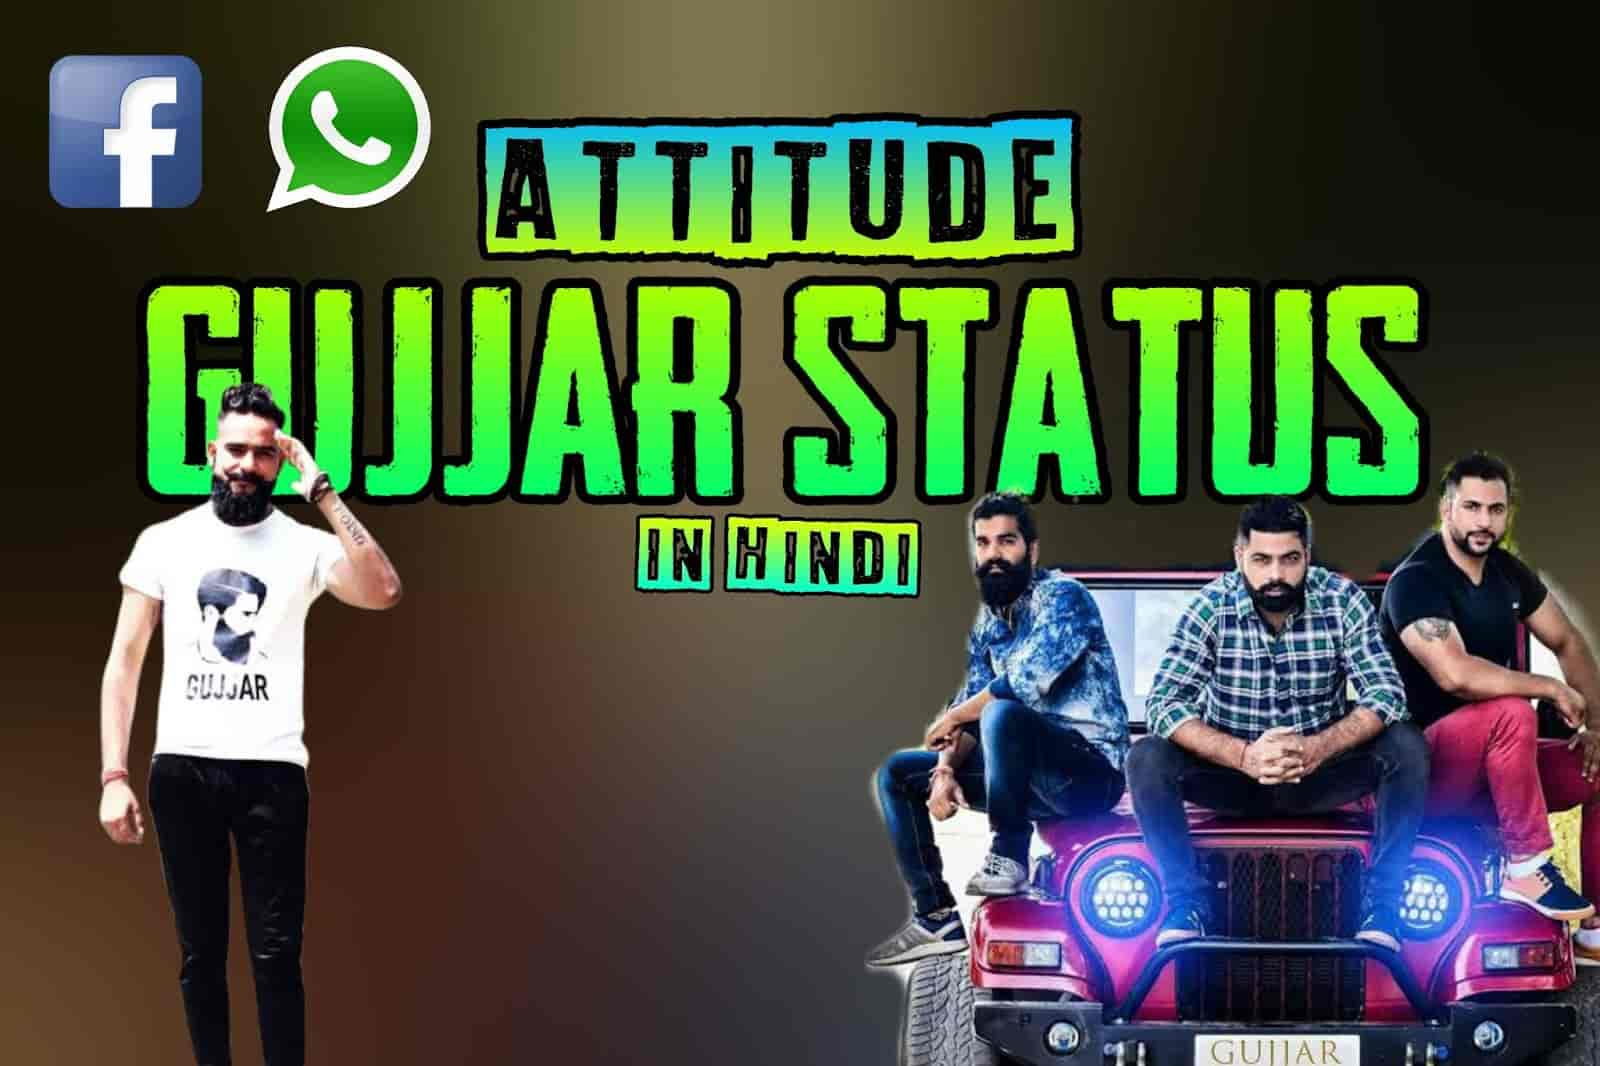 attitude gujjar status